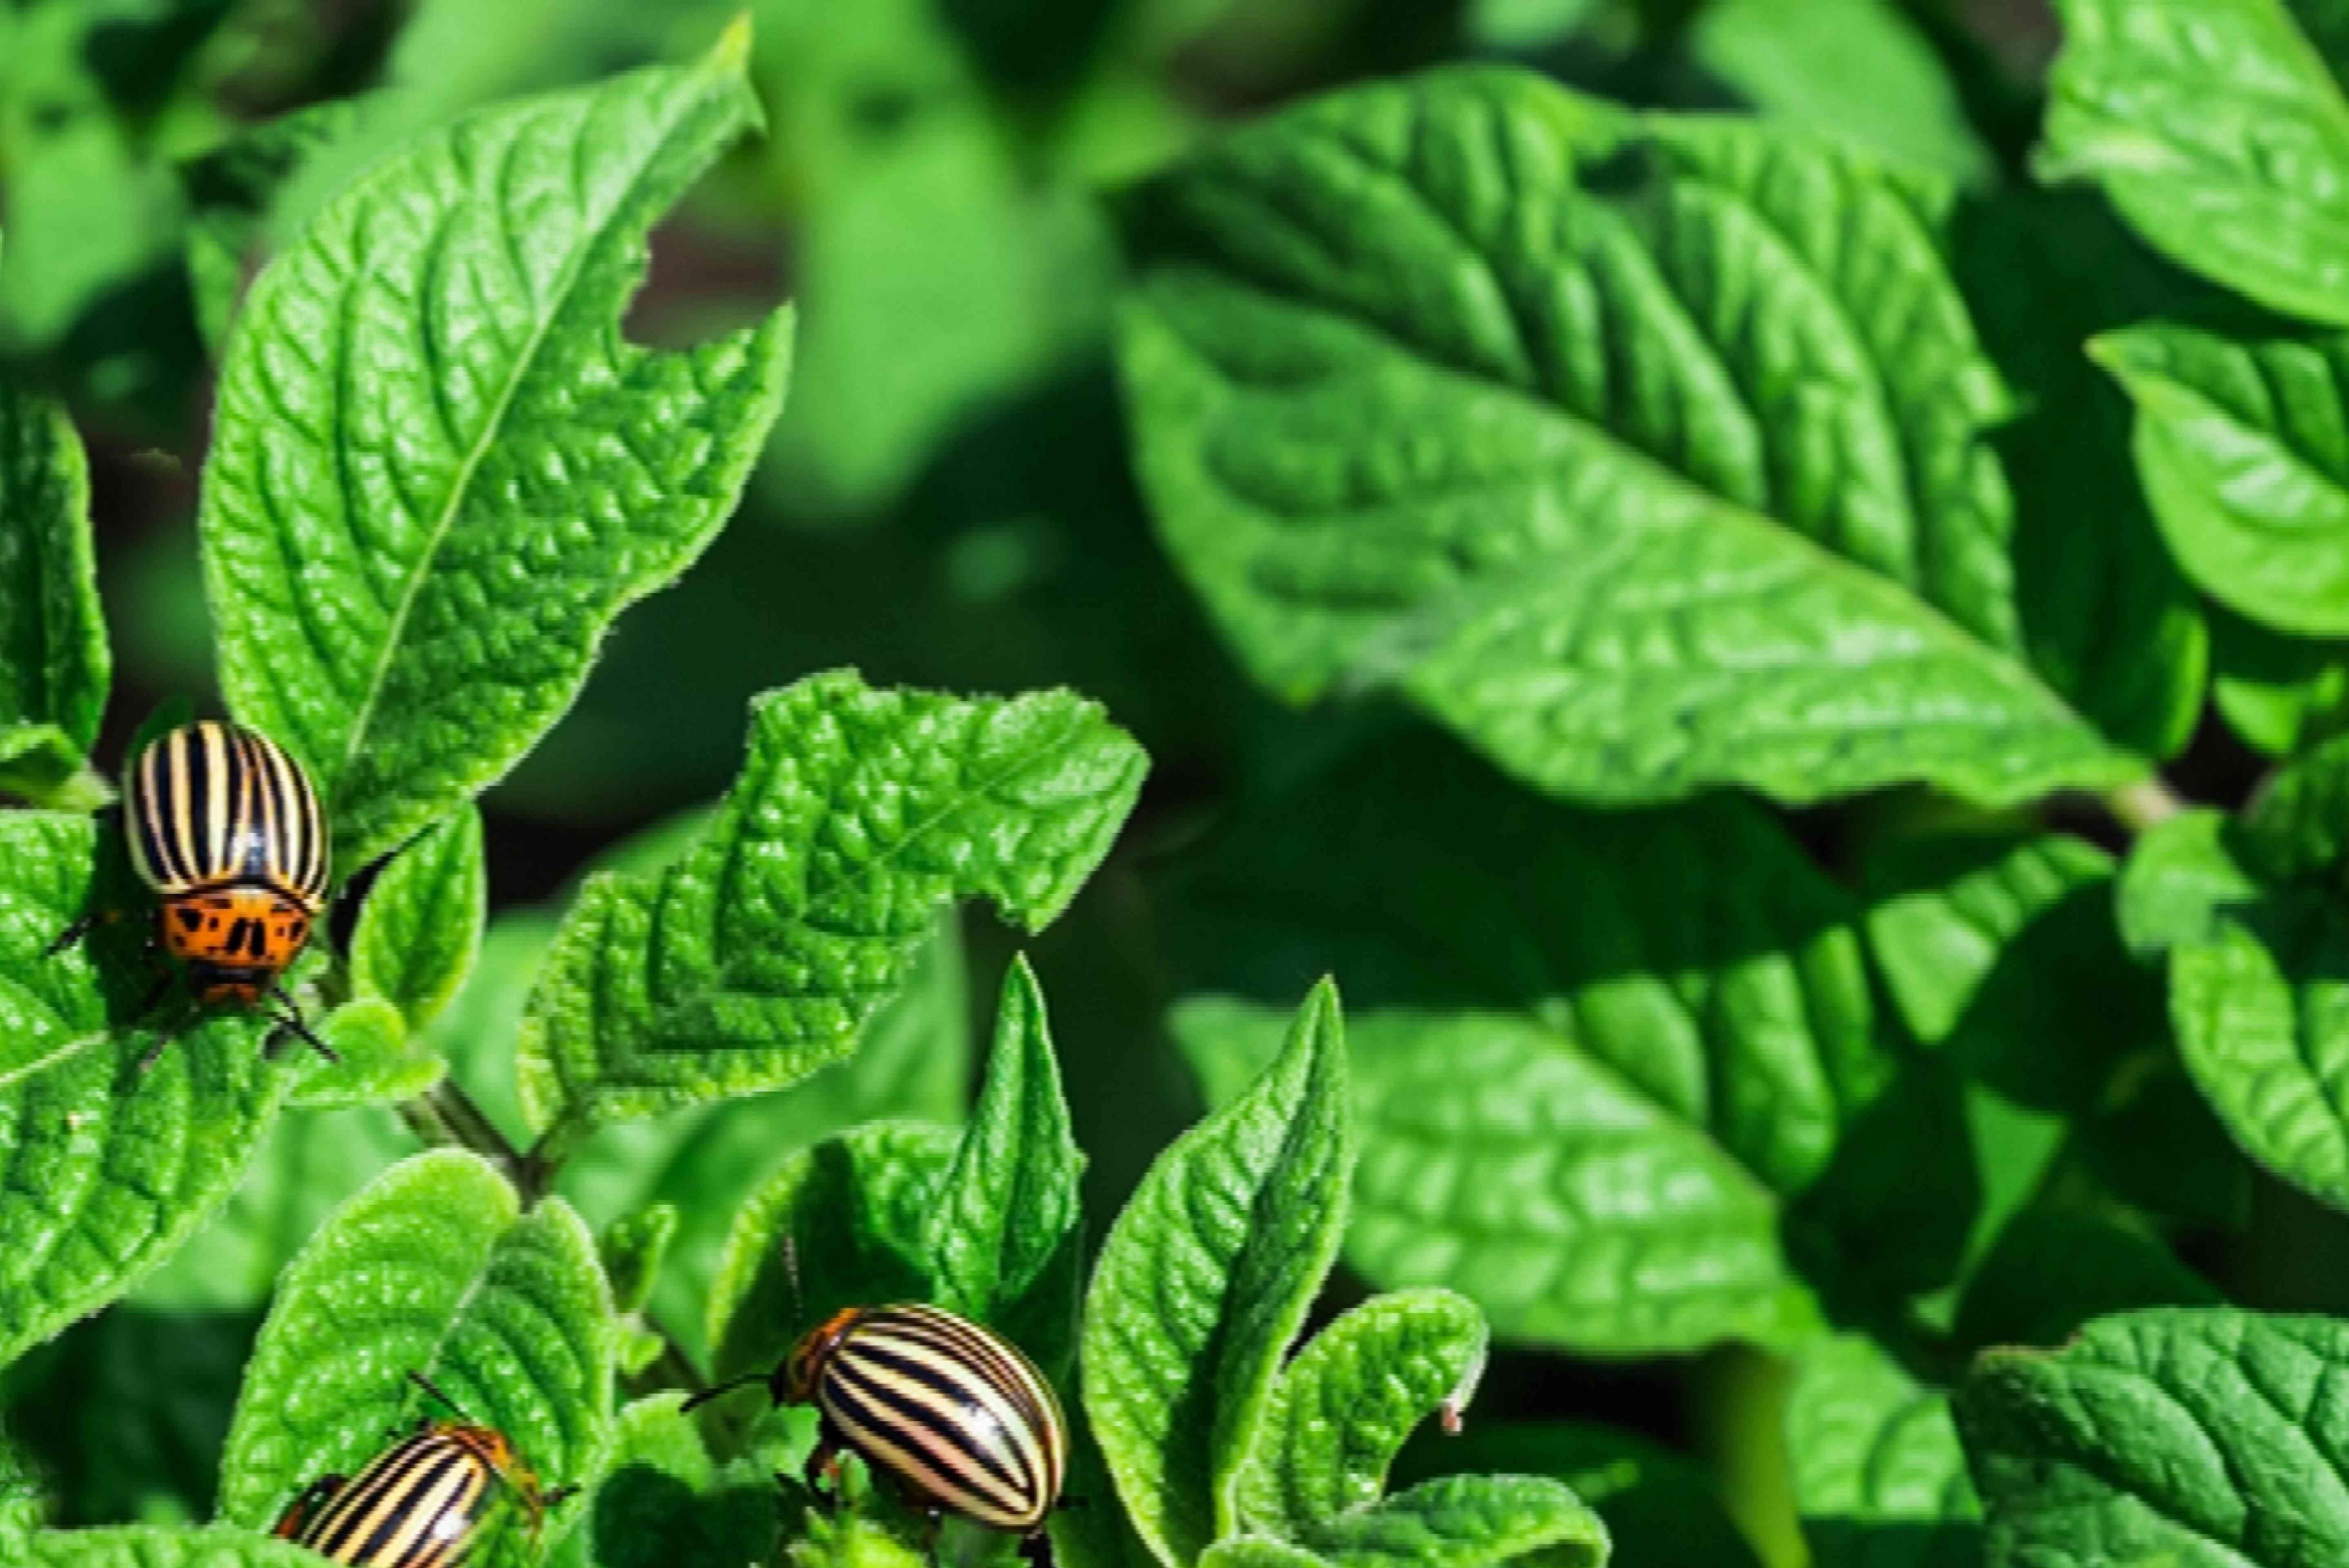 beetles on potato plants